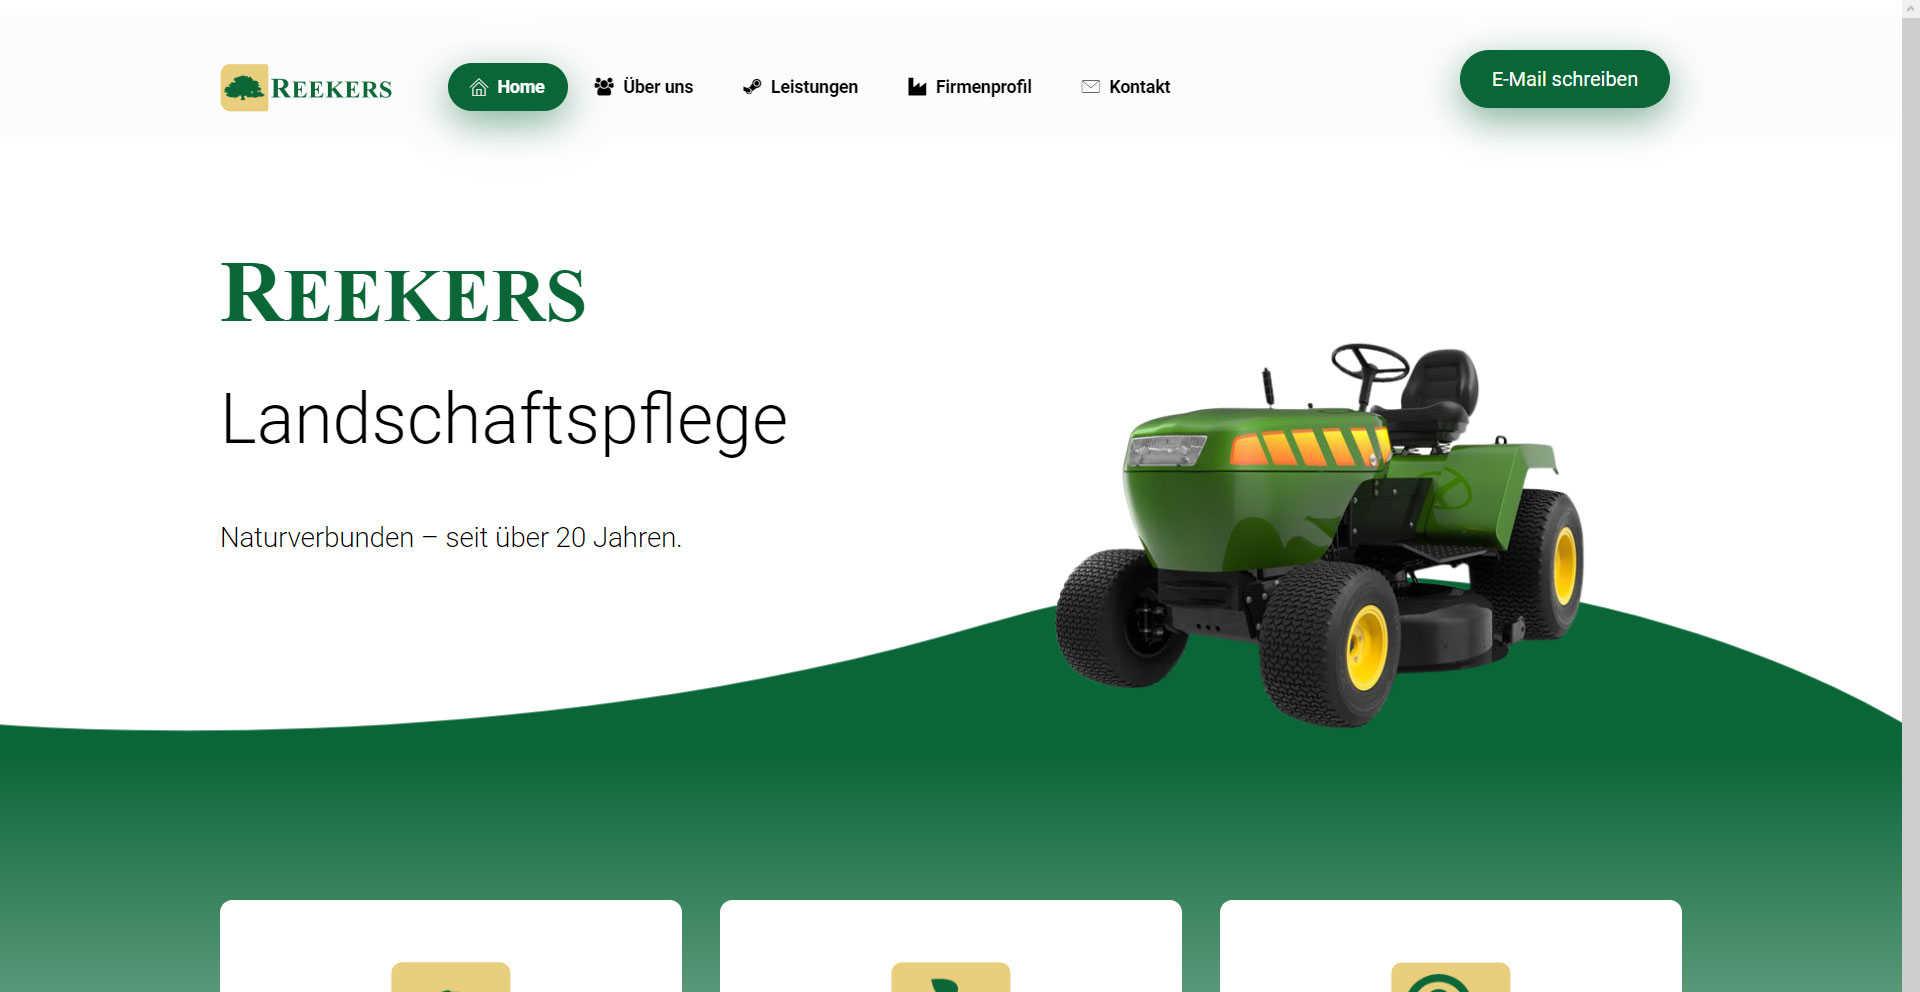 REEKERS Landschaftspflege - Ibbenbüren